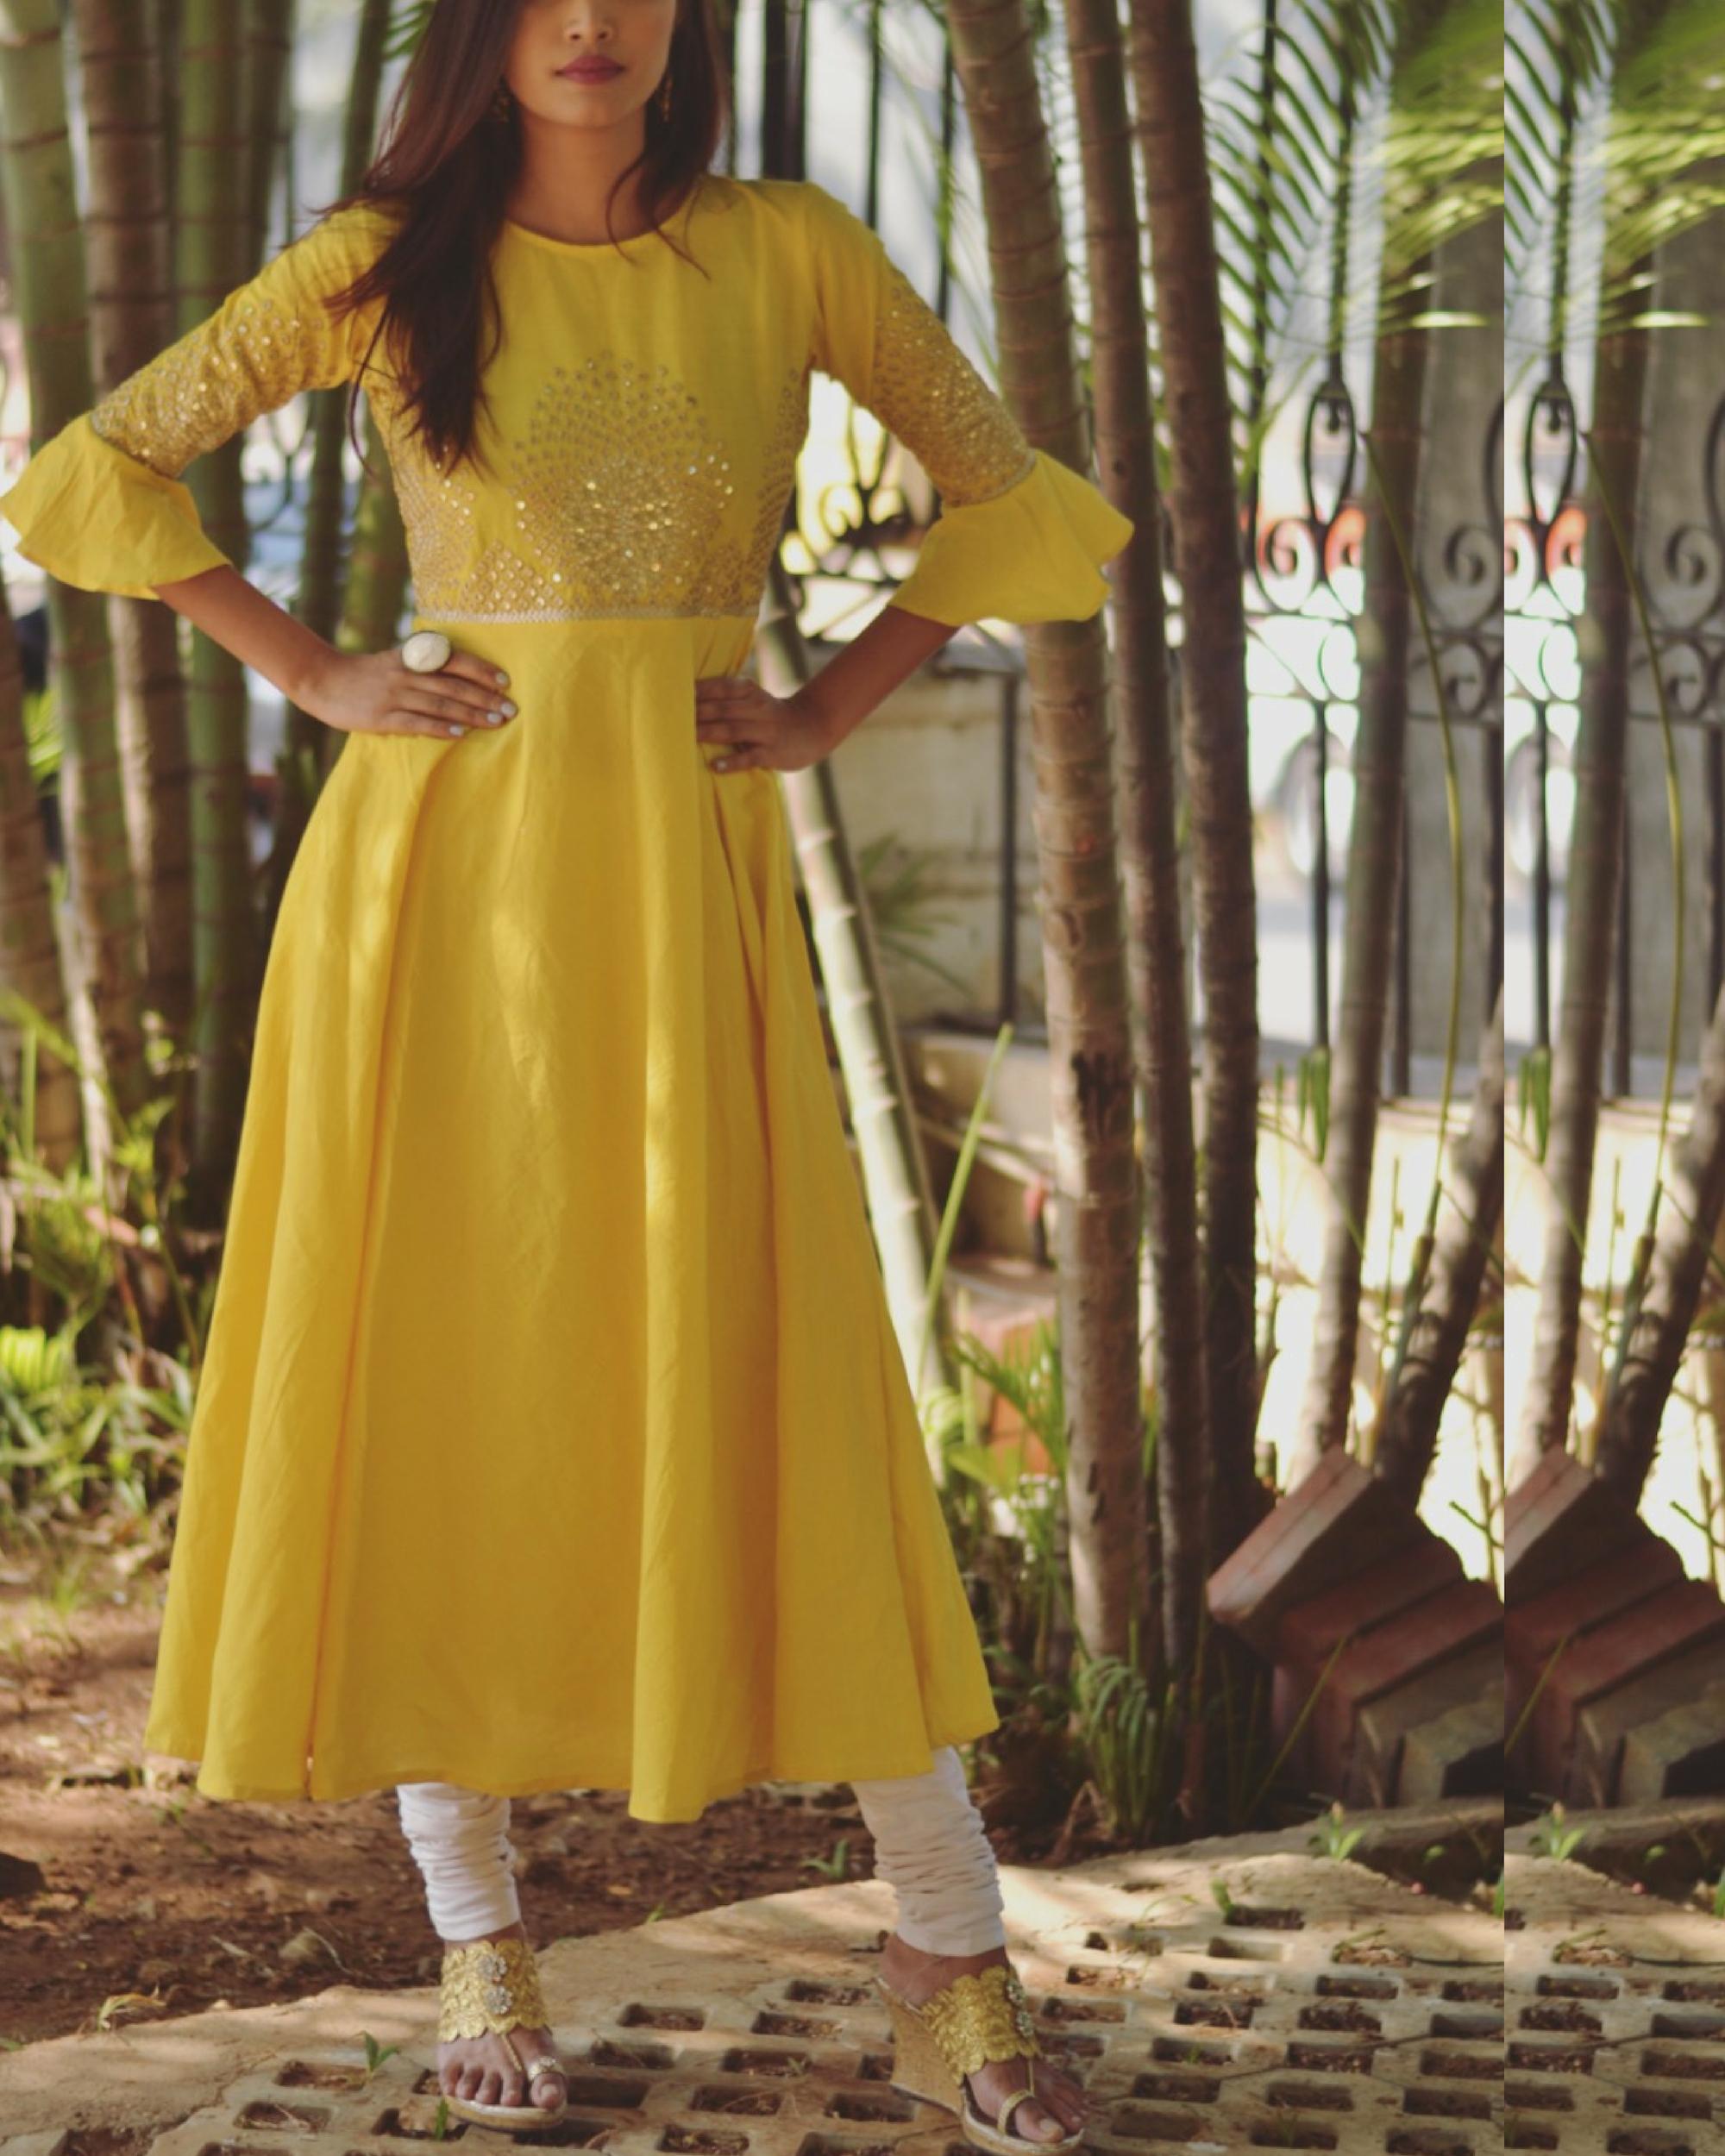 Yellow bell sleeve dress